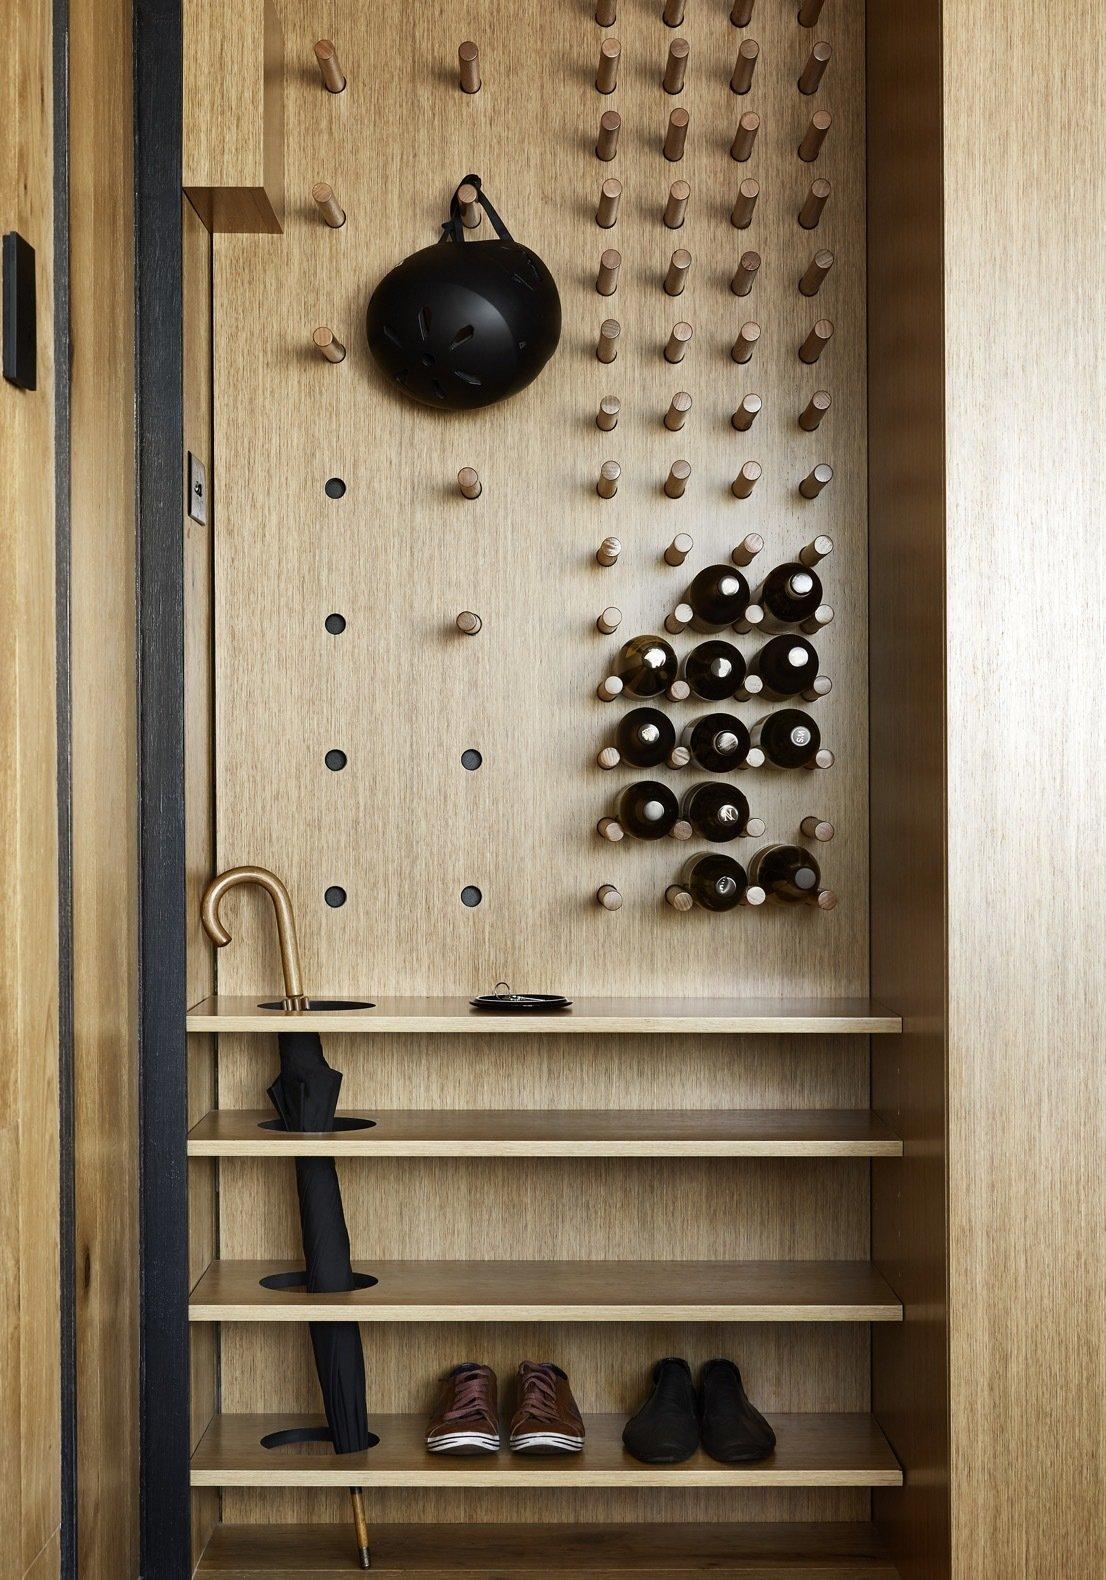 A Tiny Apartment Is Transformed Into an Award-Winning Minimalist Masterpiece